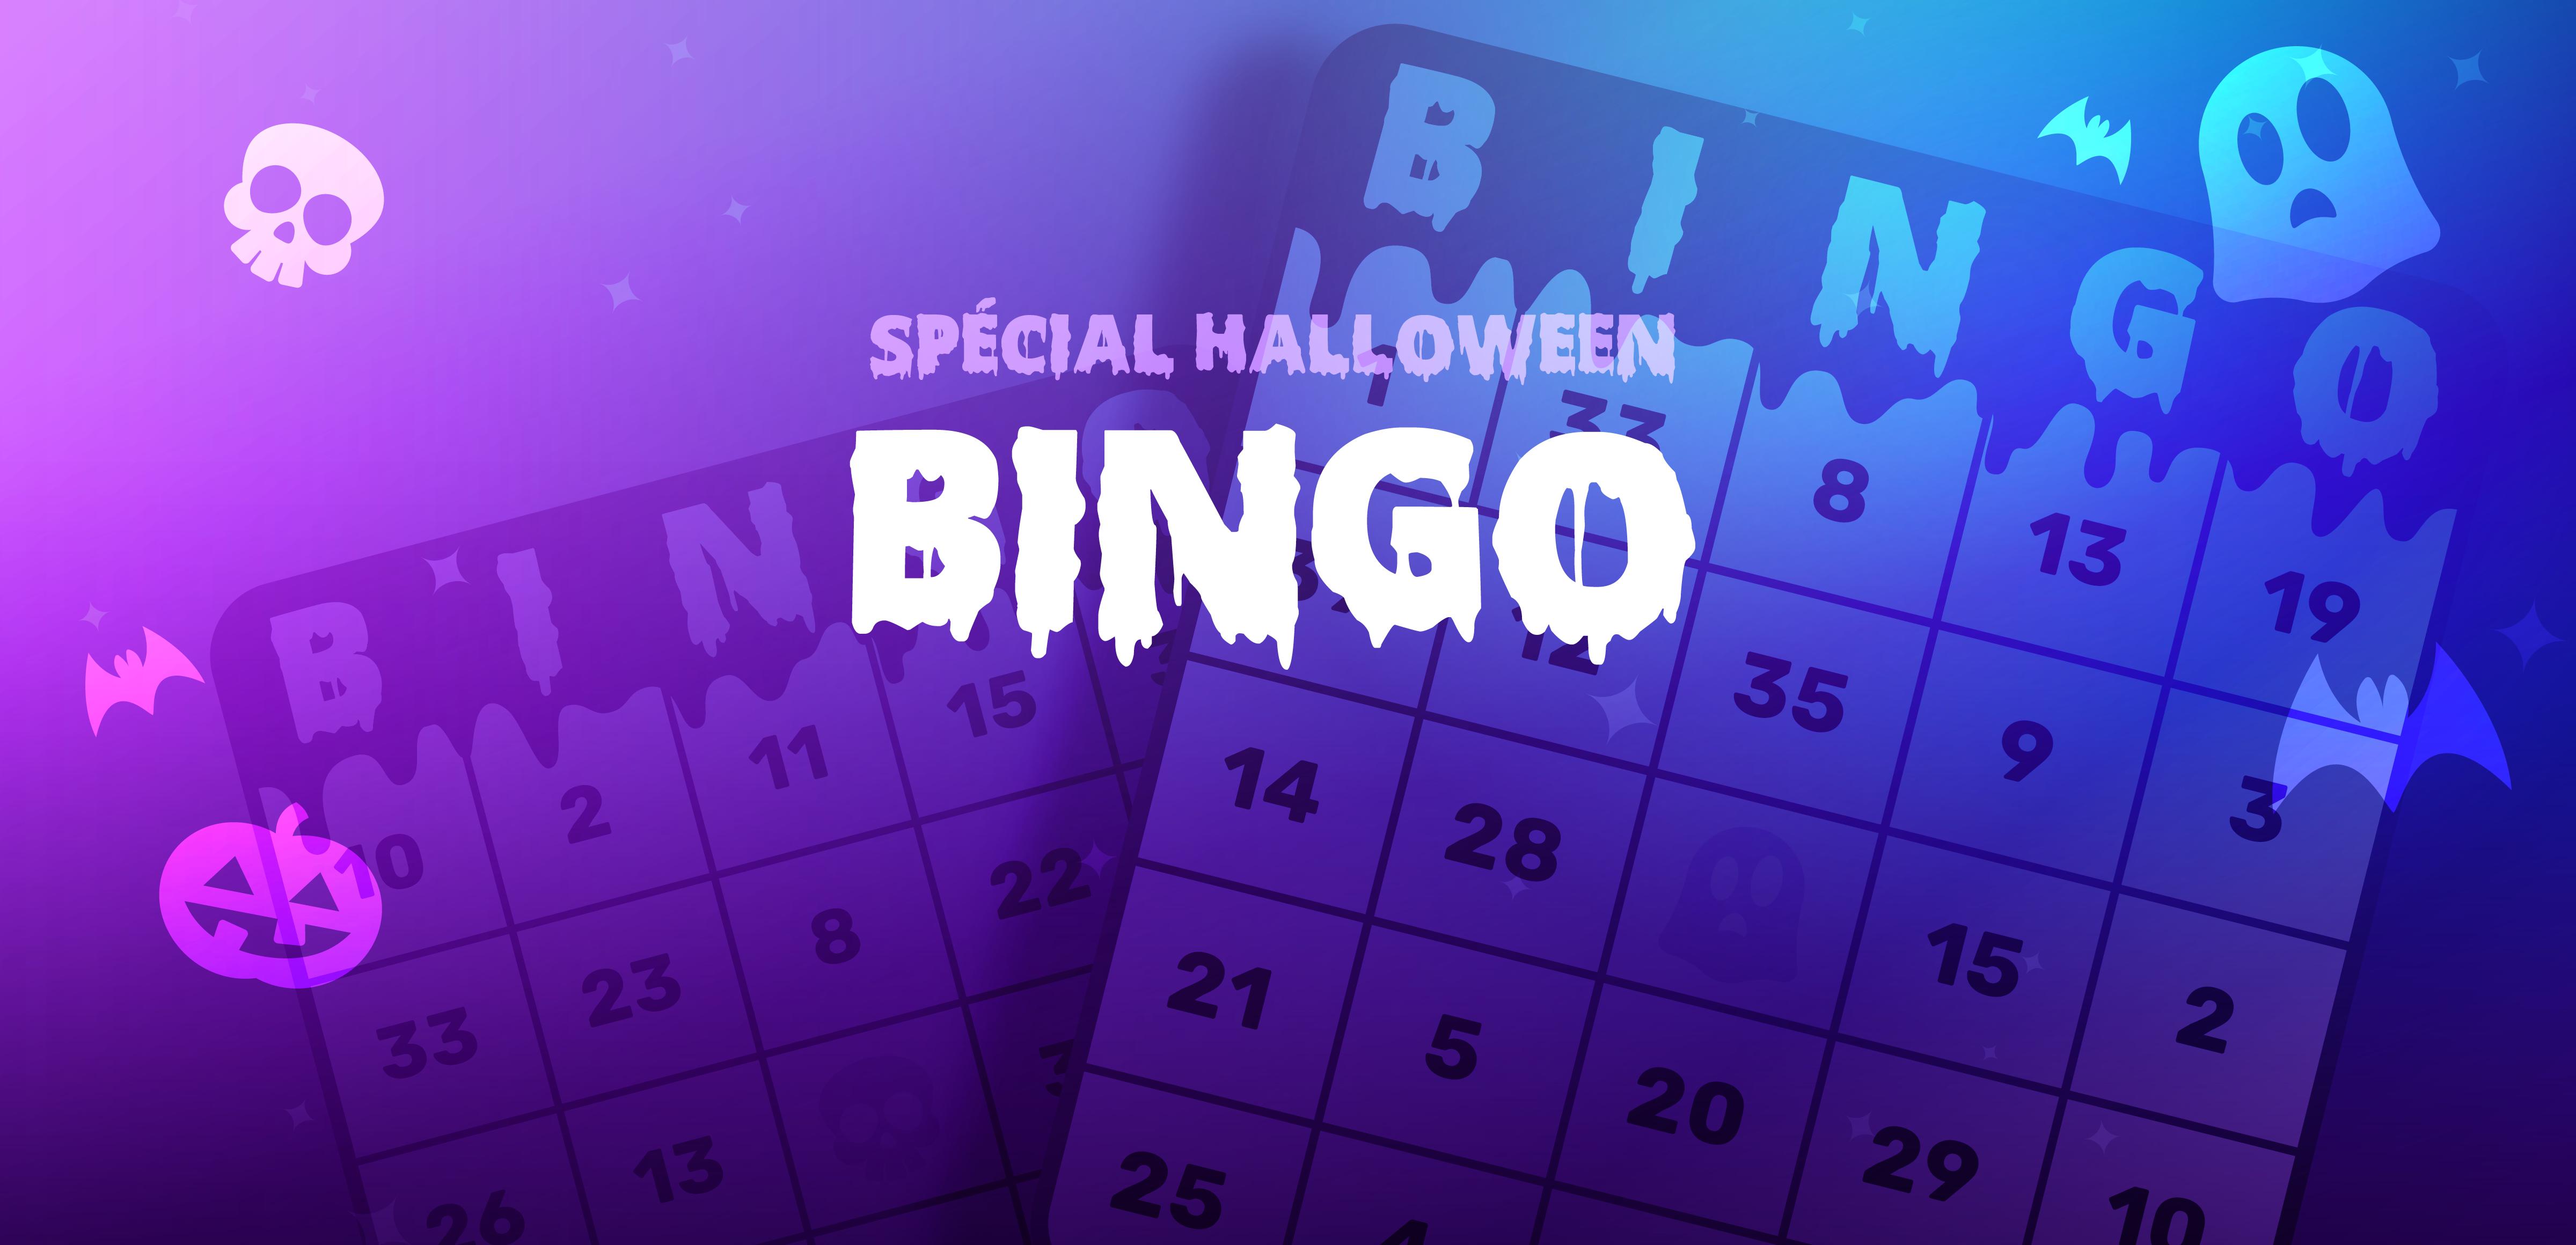 Activités d'Halloween :  Bingo mathématique!